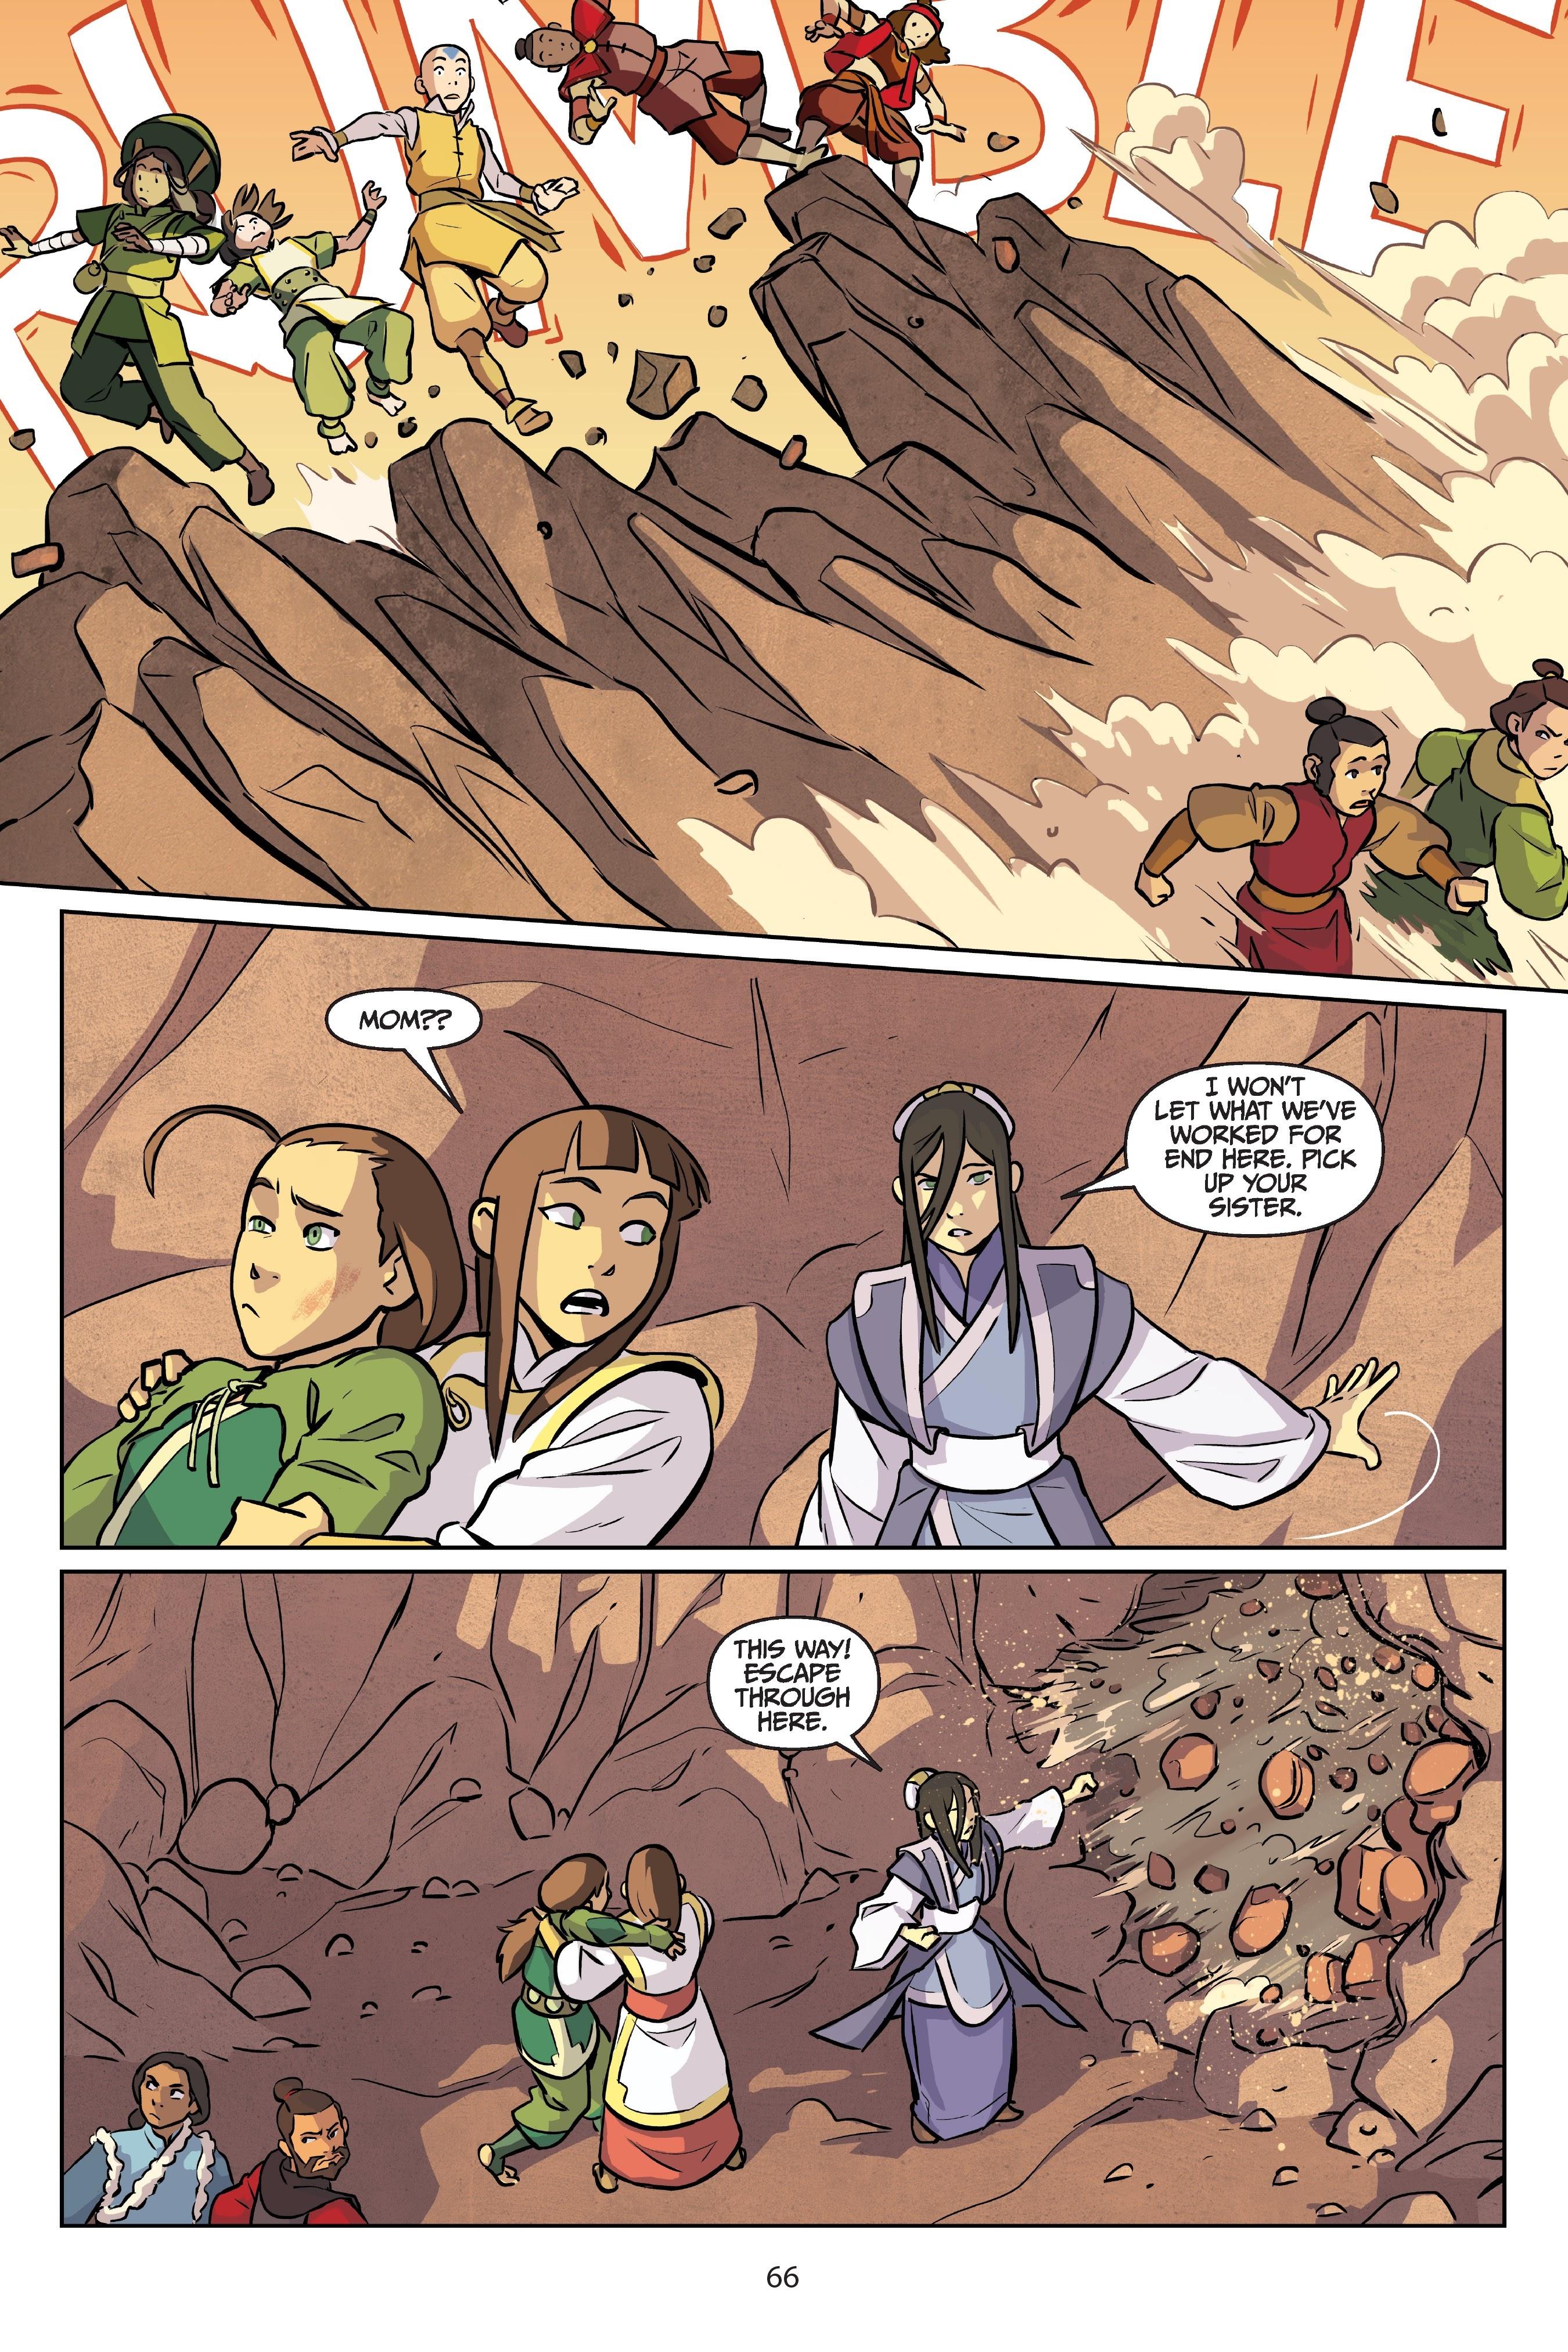 Nickelodeon Avatar: The Last Airbender - Imbalance TPB_2 Page 66